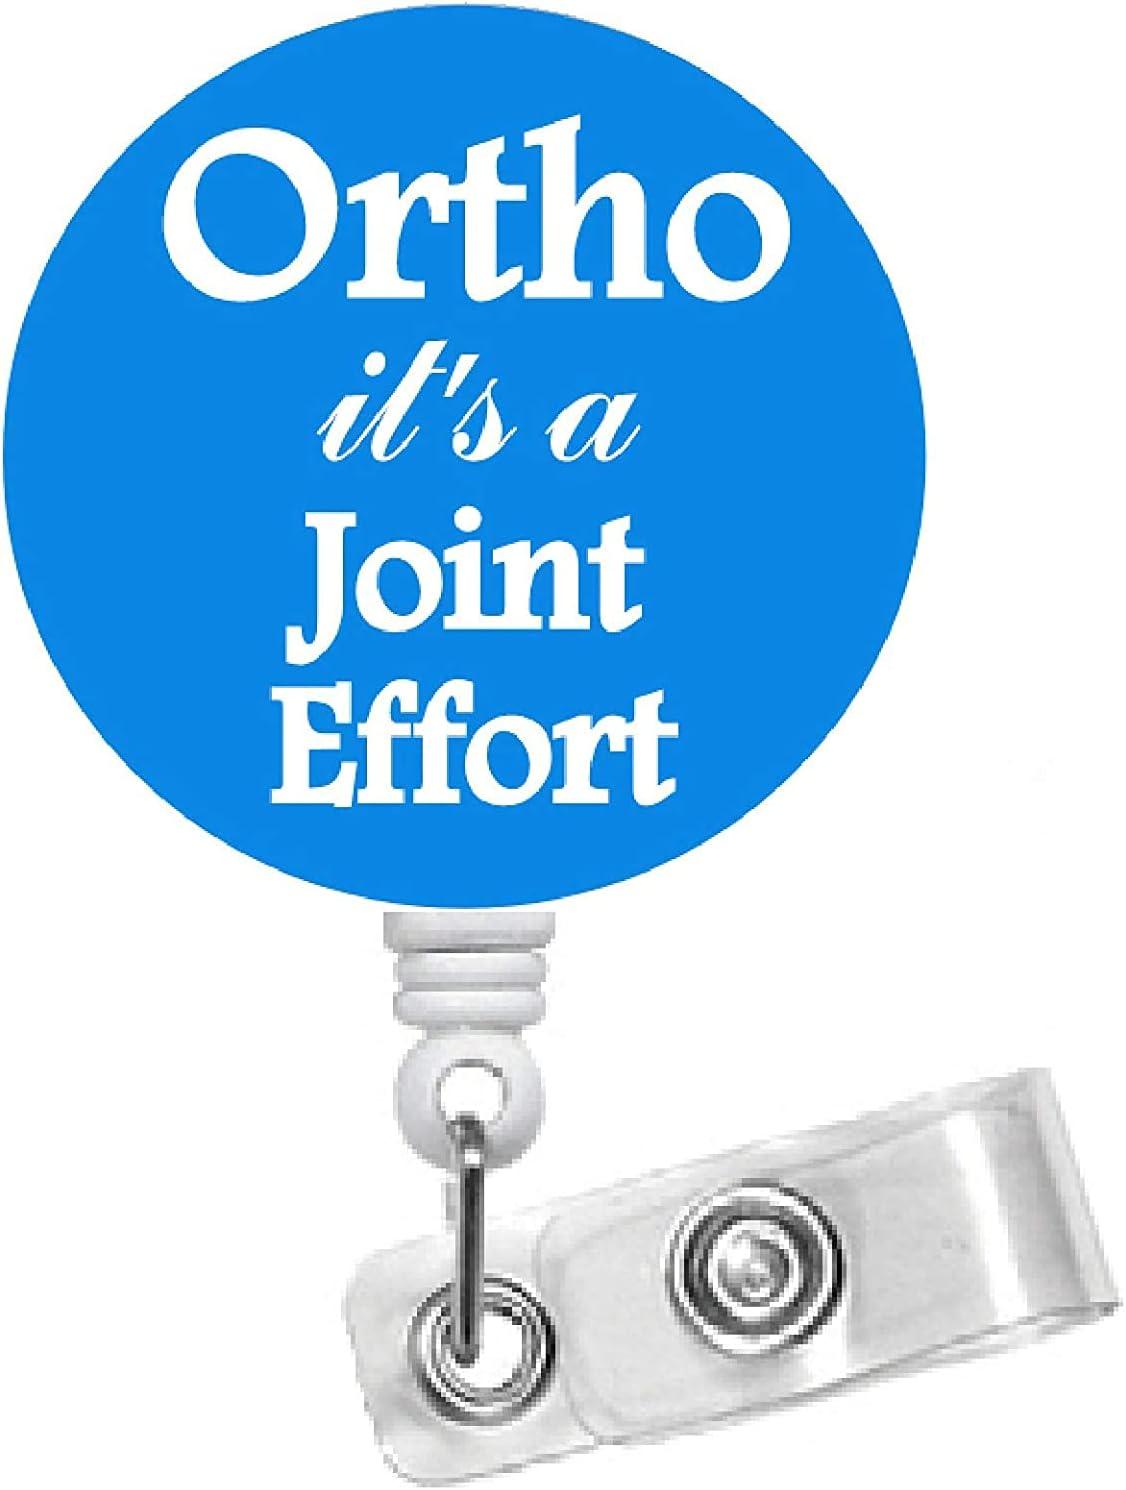 Ortho Badge National products Holder - Tech Nurse Max 50% OFF Orthopedic